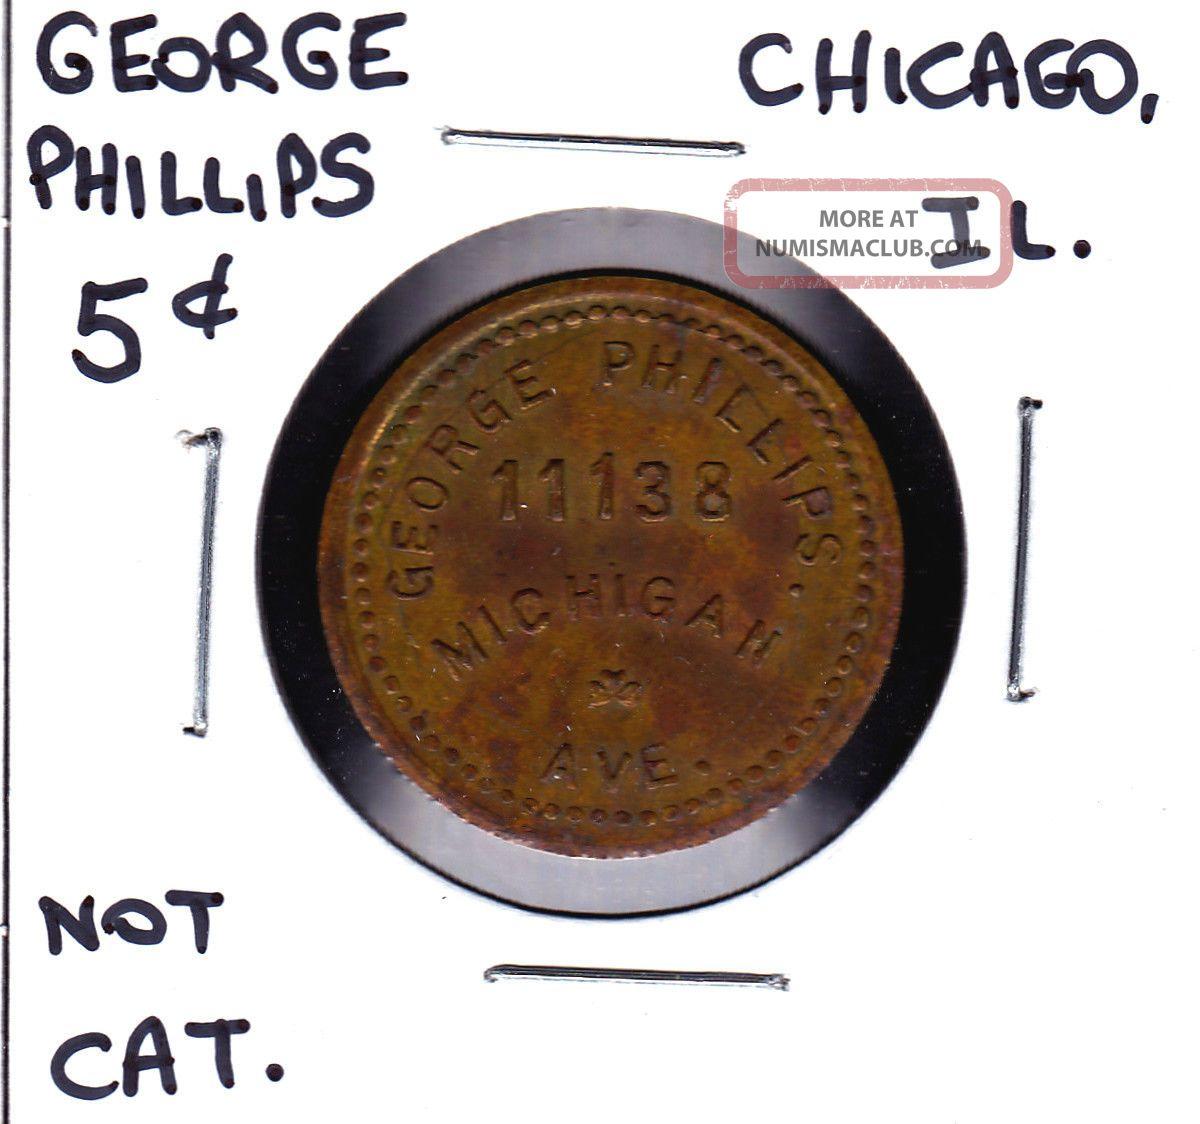 Uncataloged George Phillips,  Chicago,  Illinois 5 Cents Merchant Token Exonumia photo